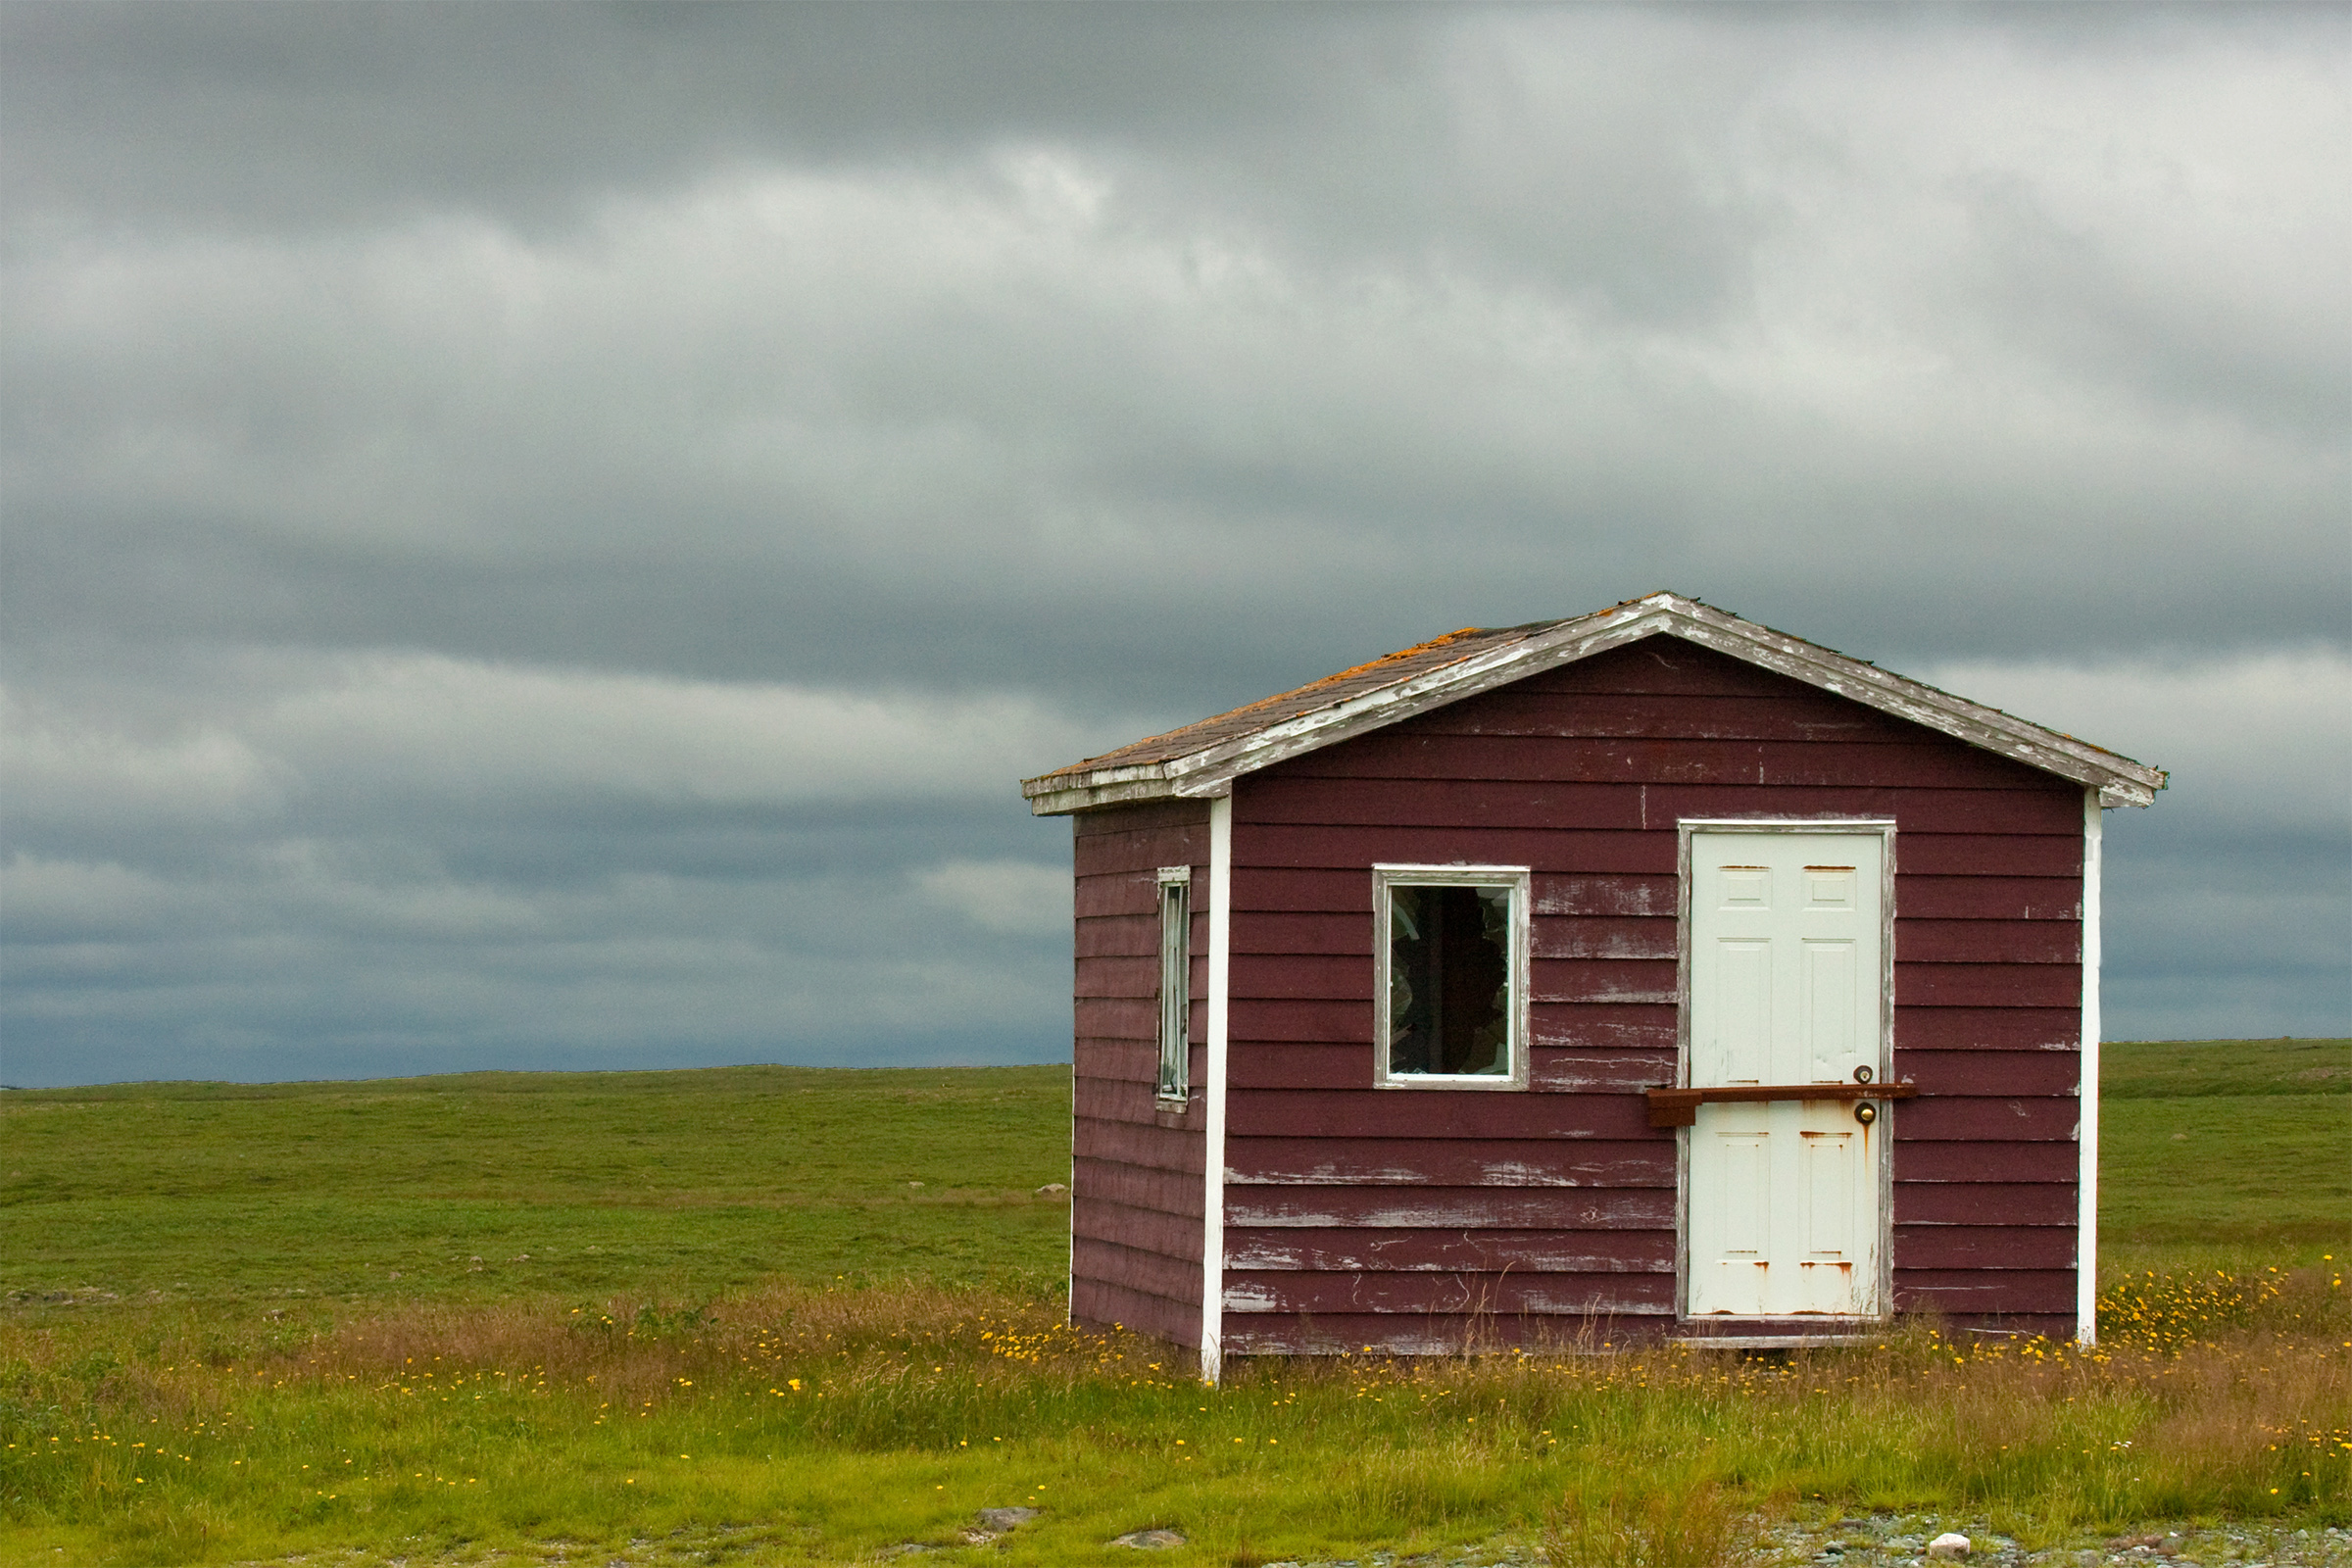 Cabin, Abandoned, Locked, Red, Rain, HQ Photo